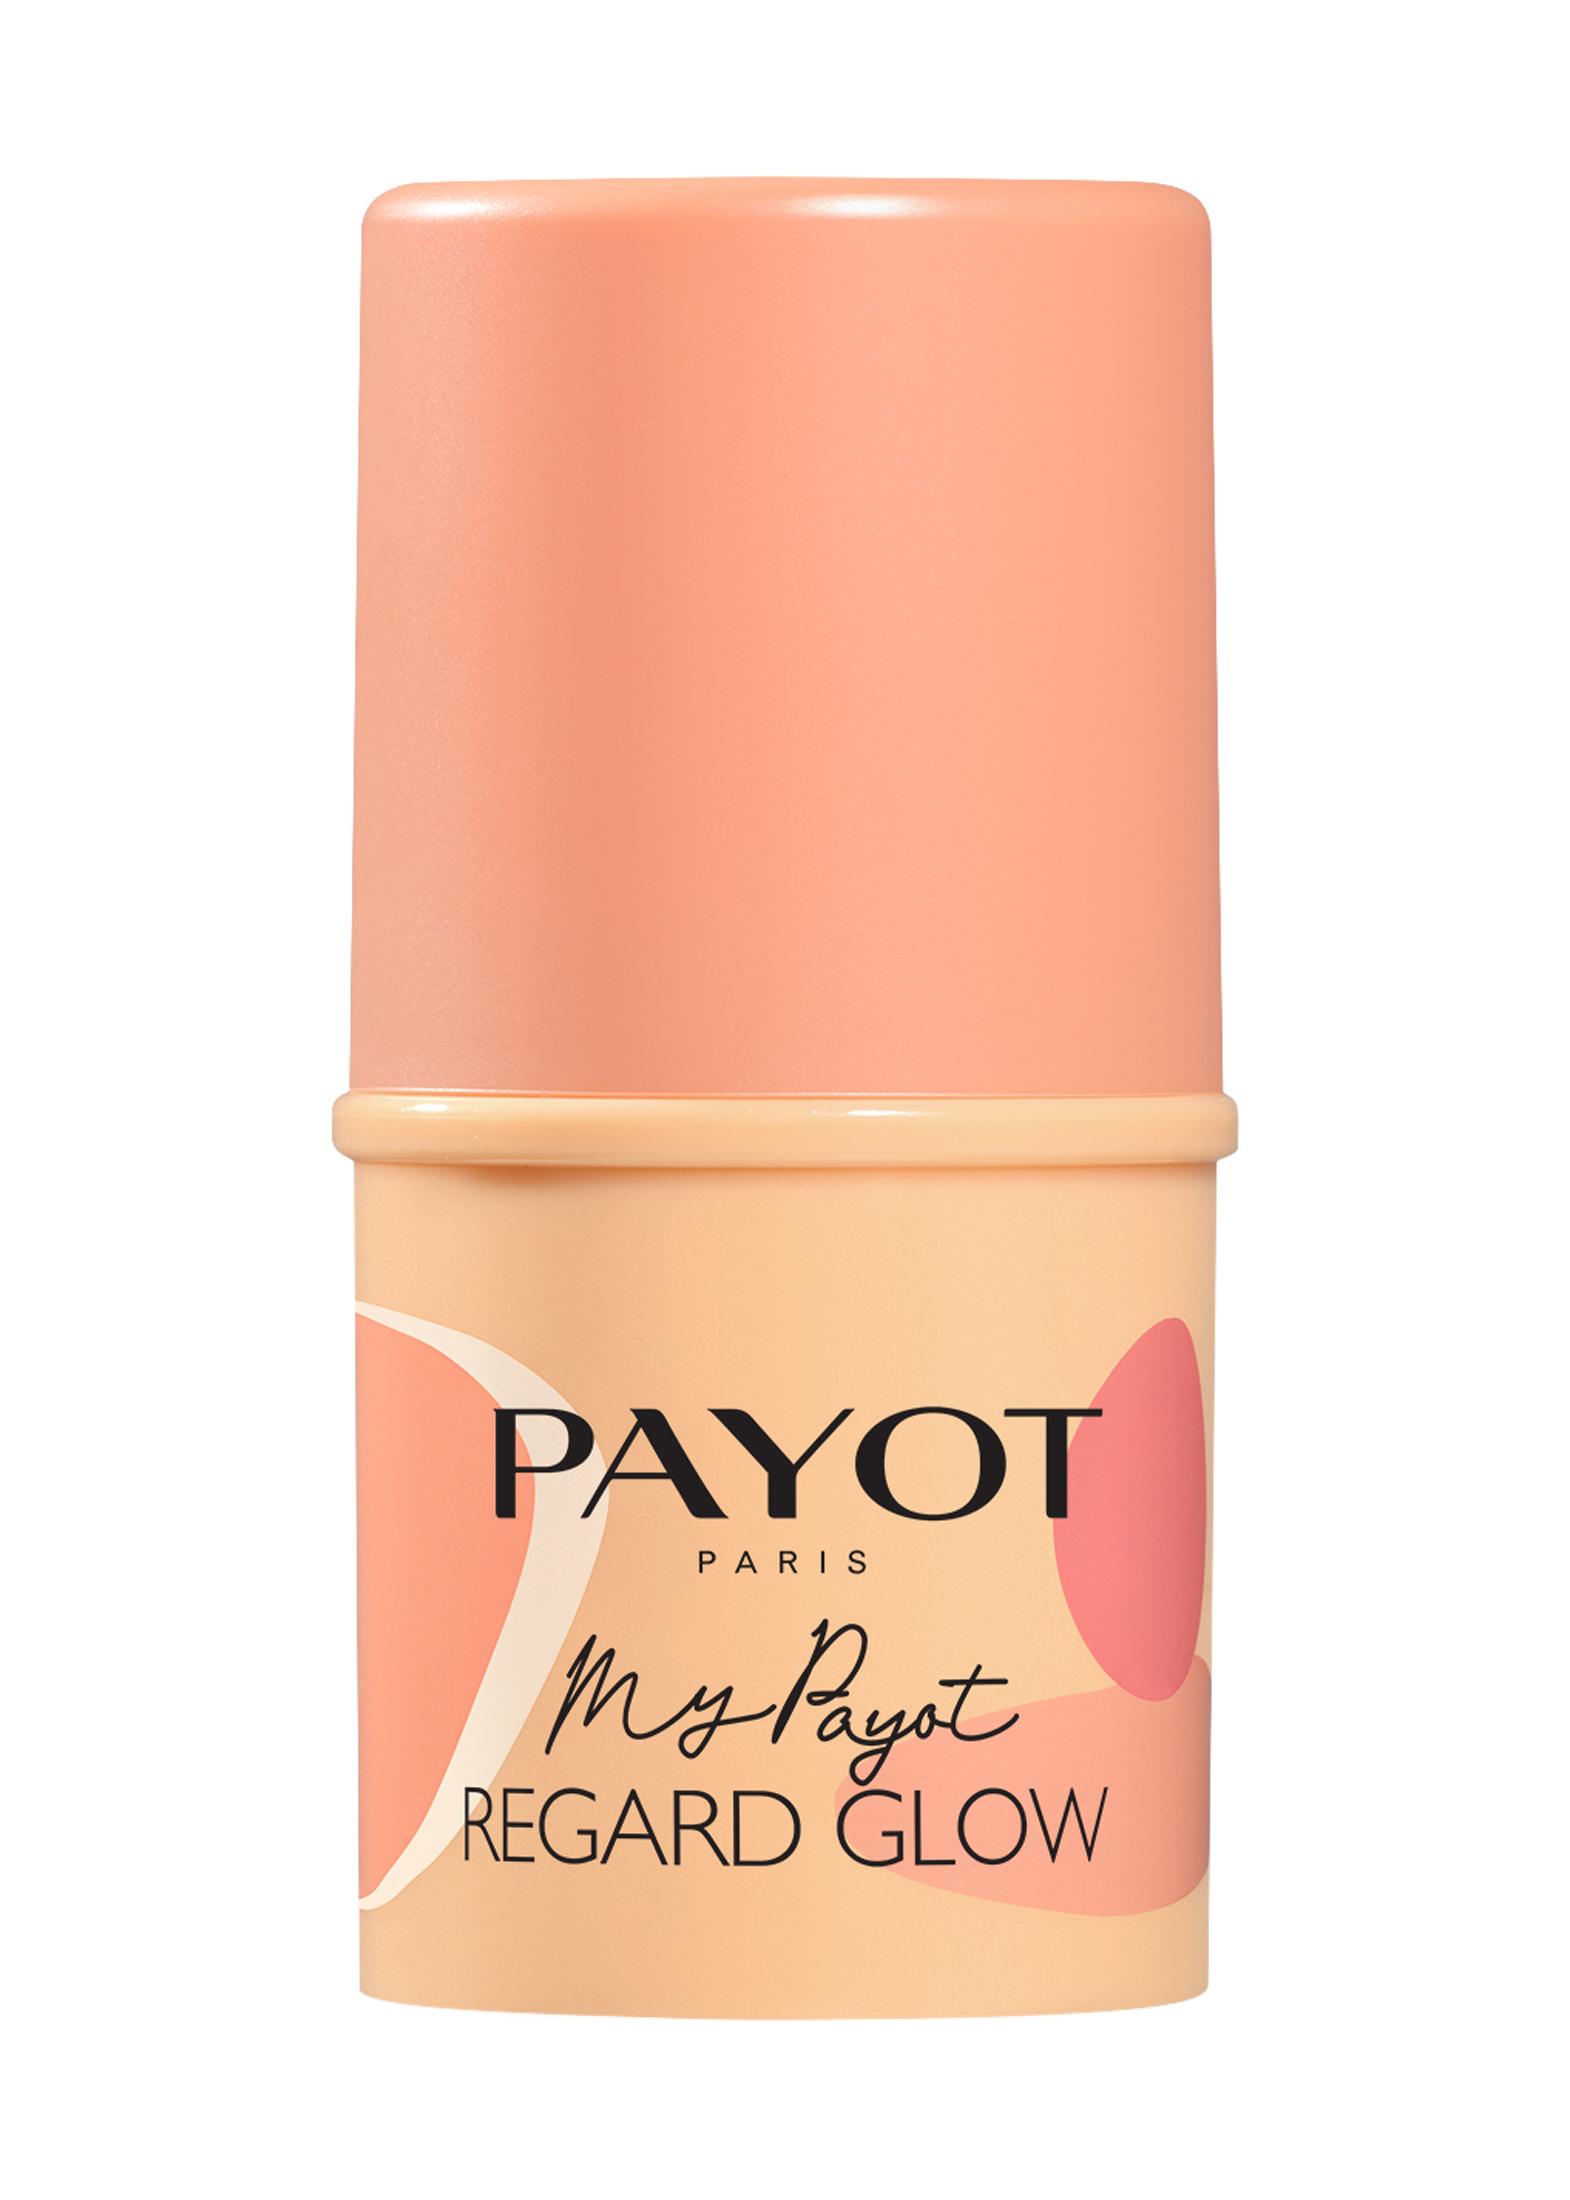 My Payot Regard Glow, 4,5g image number 0